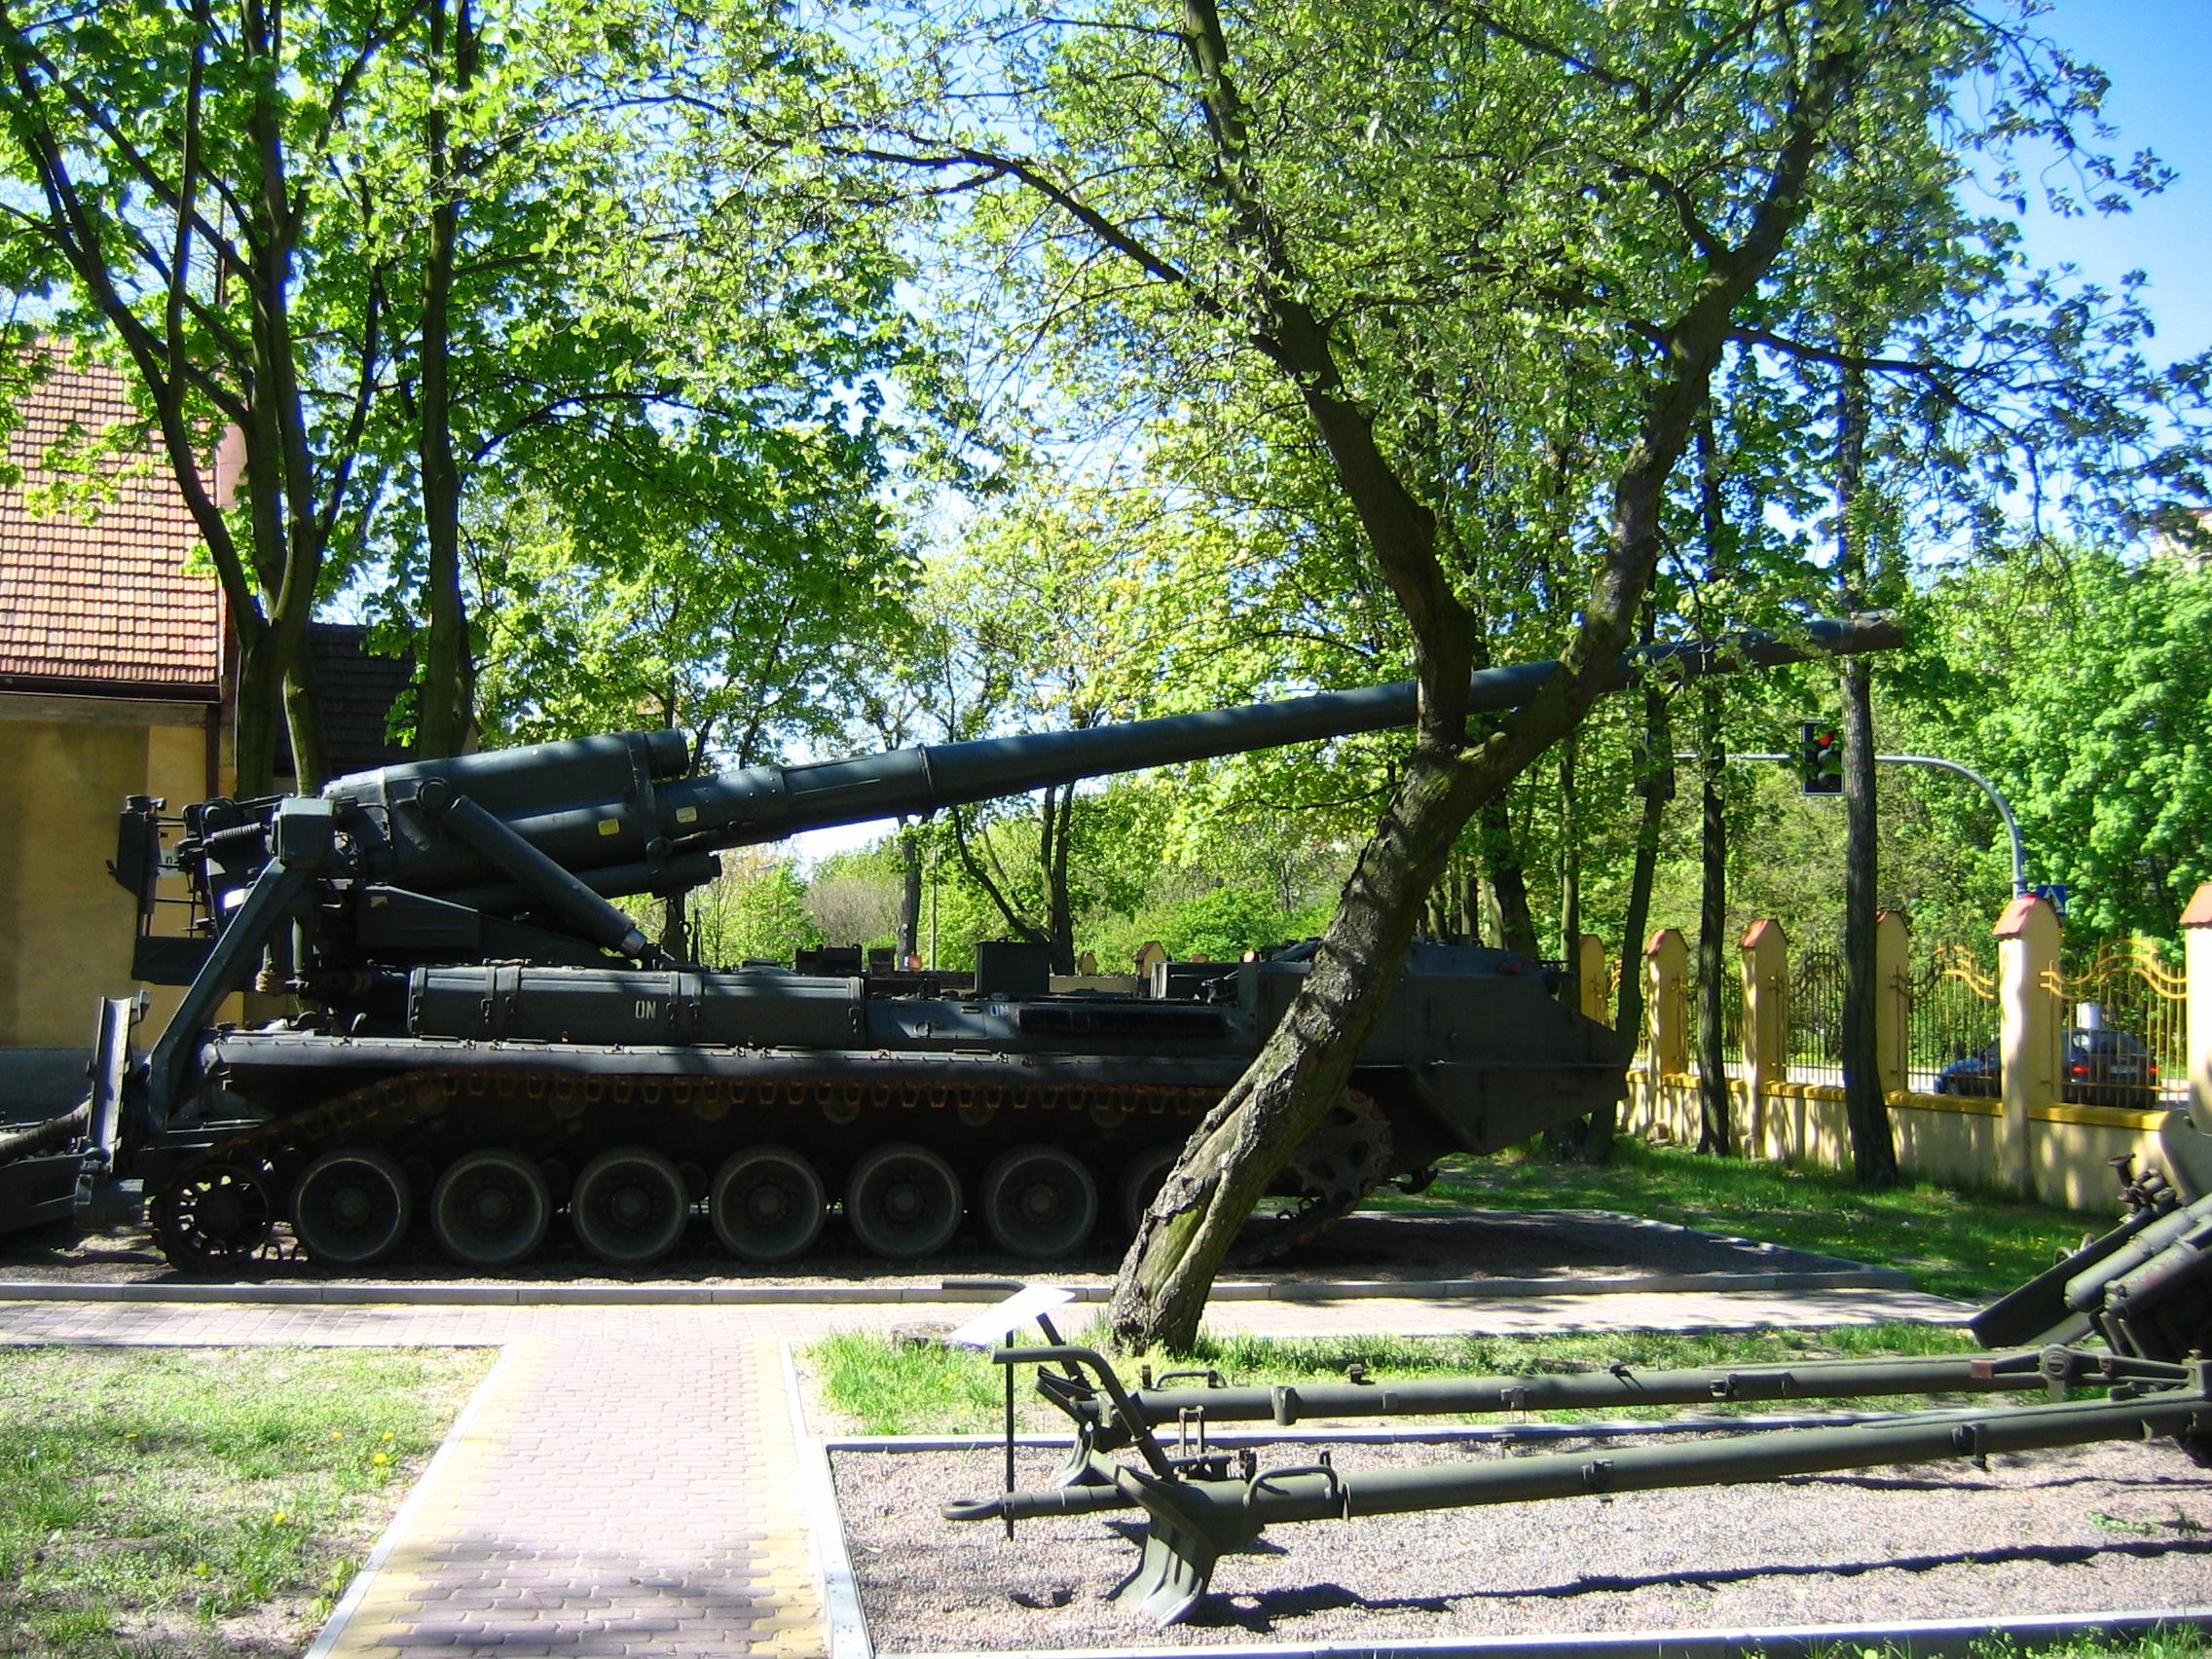 http://upload.wikimedia.org/wikipedia/commons/c/c2/Armata_samobiezna_2S7_Pion.jpg